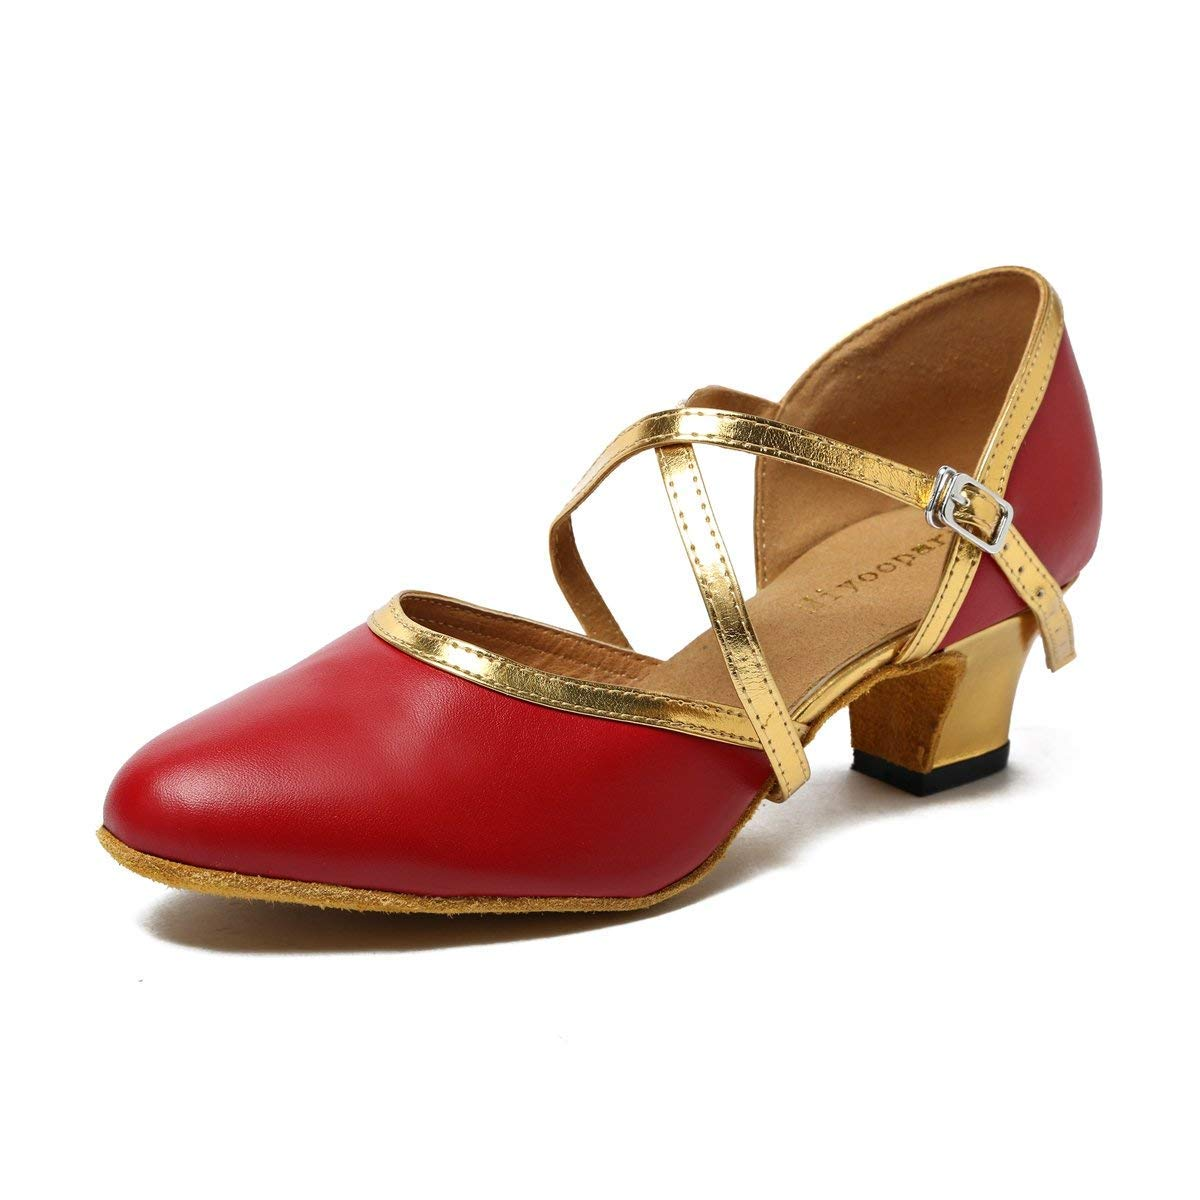 ZHRUI Damen Tanzschuhe (Farbe   Burgundy Gold-5cm Heel Größe   8 UK)